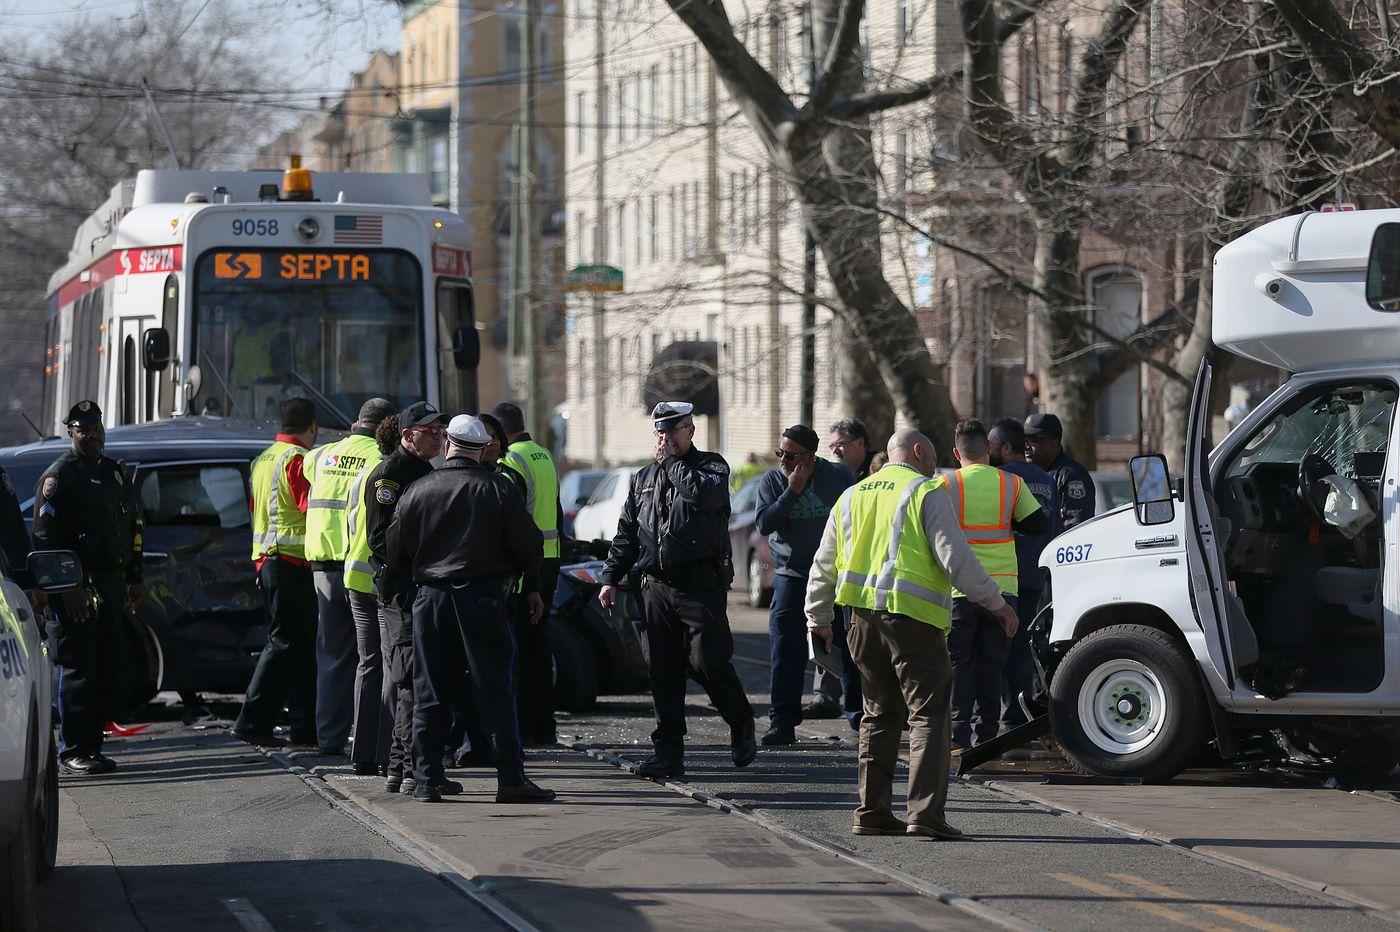 Crash involving SUV, SEPTA paratransit van, and trolley leaves 30 hurt in West Philadelphia